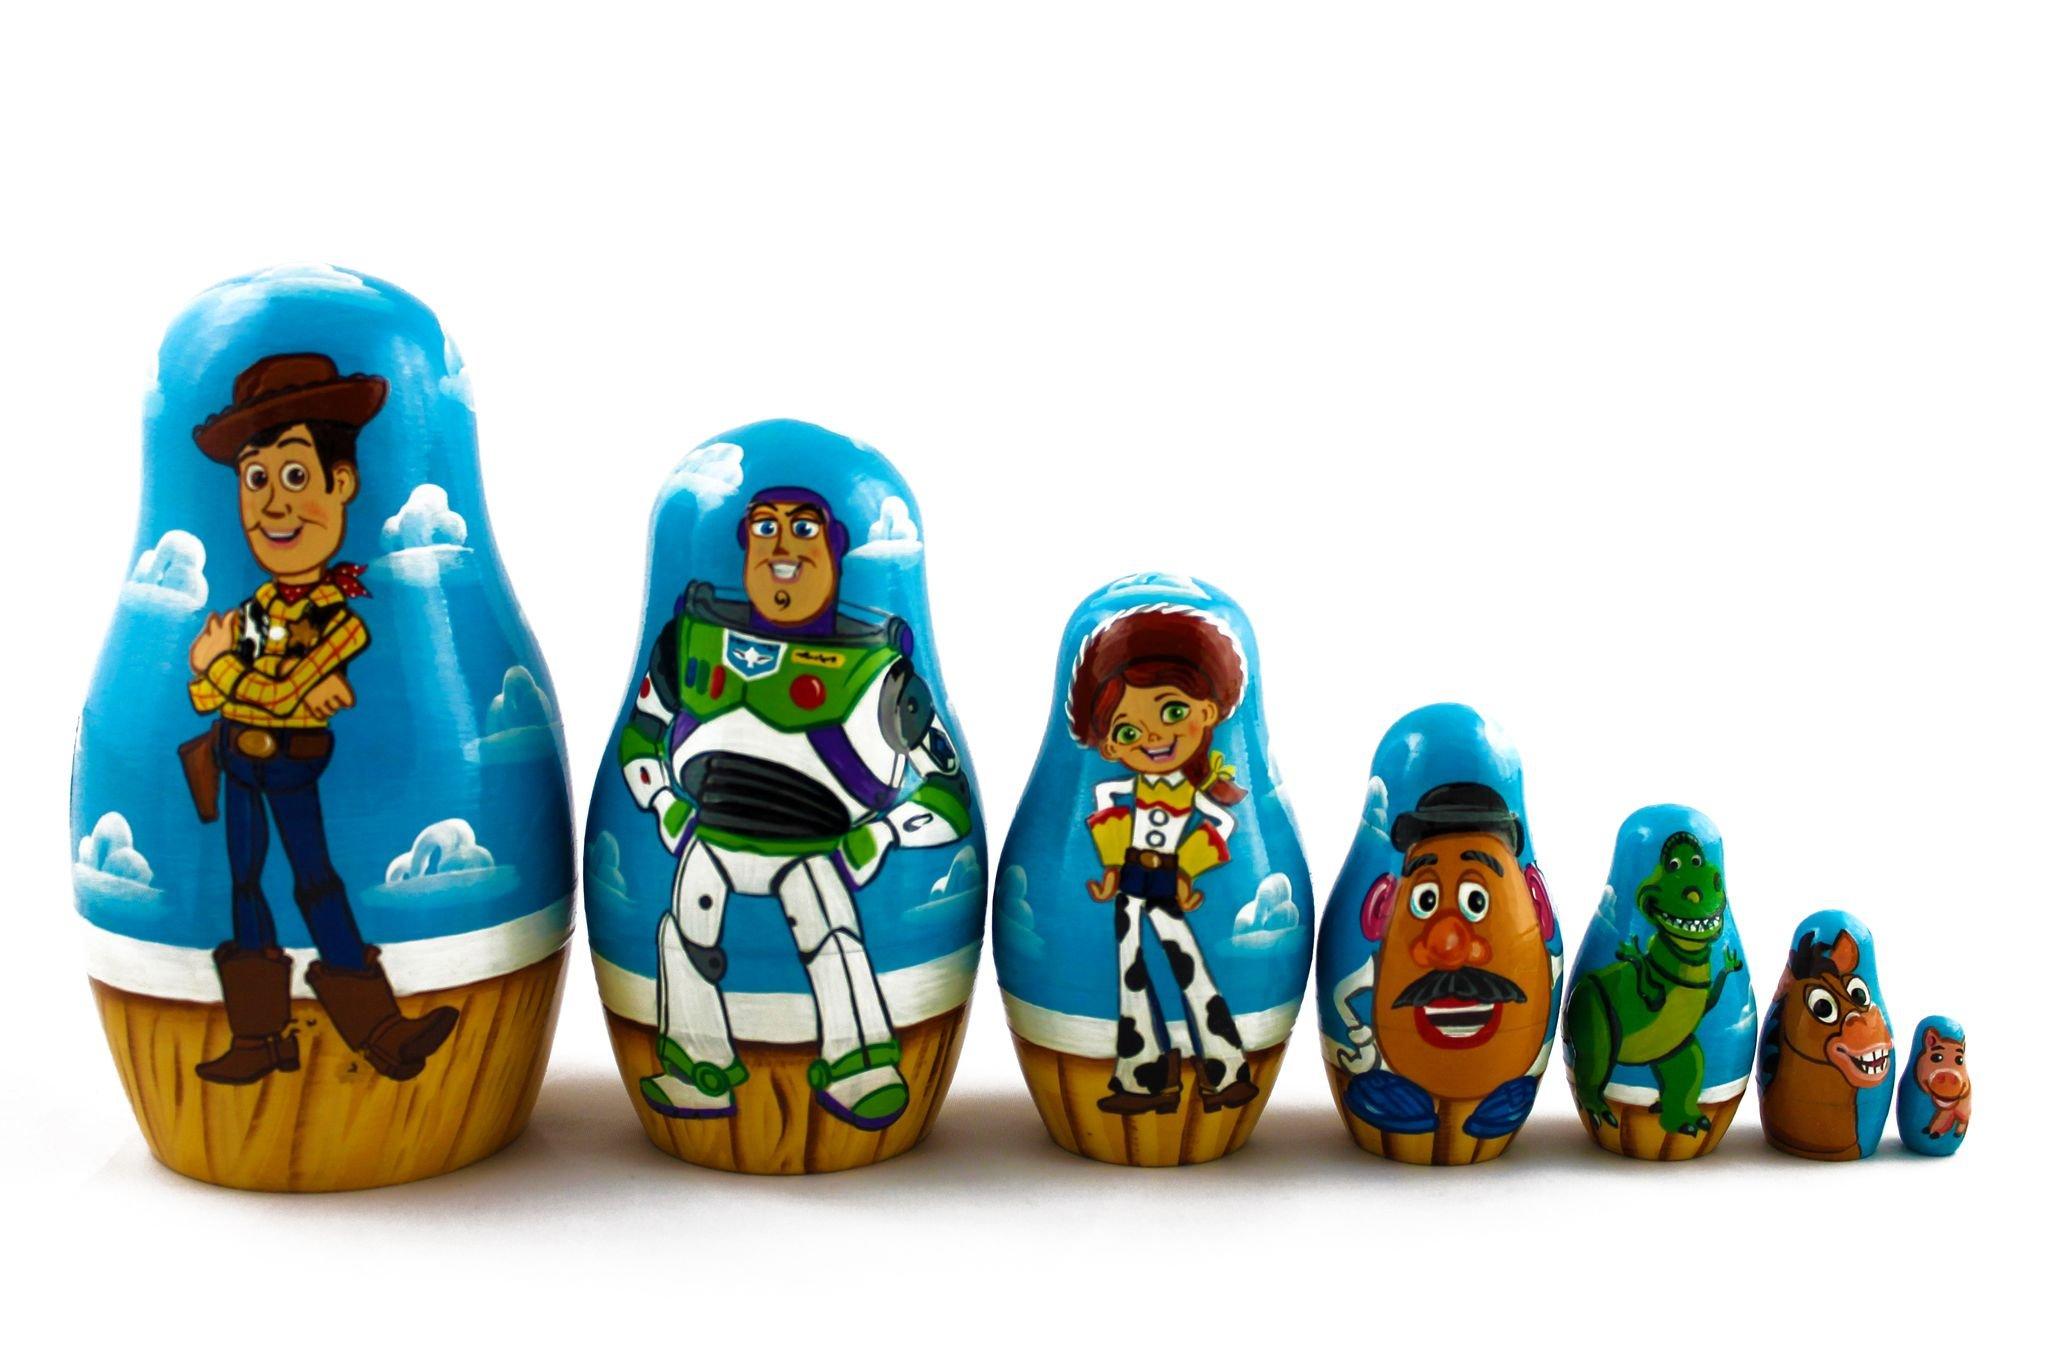 Matryoshka Russian Nesting Wooden Doll Toy Story Cartoon 7 Pcs Set Funny Decorative Stacking Hand Painting Beautiful Nested Great Gift Craft